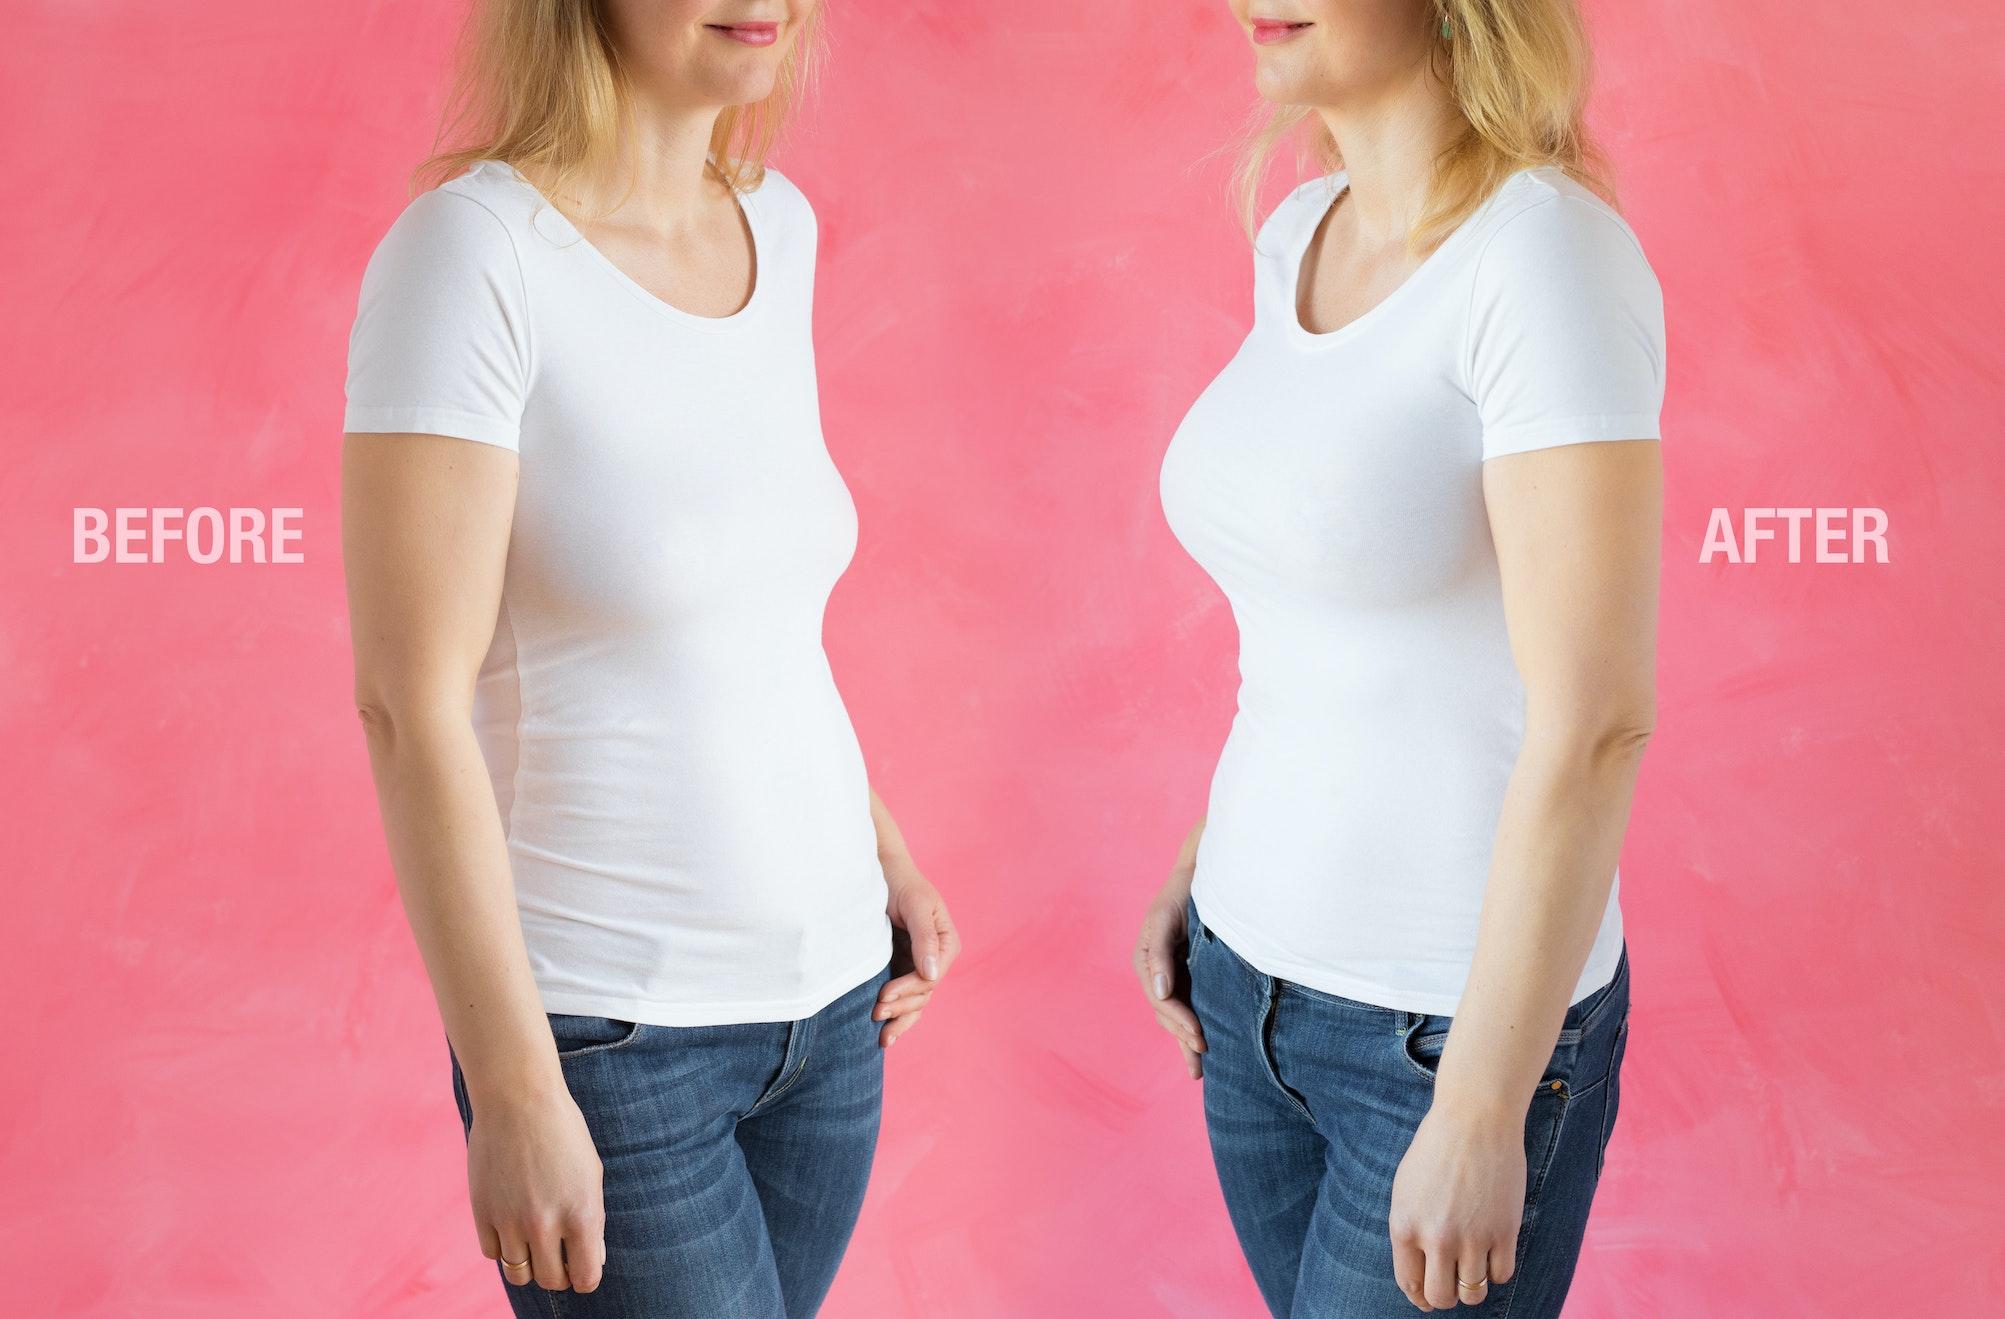 breasts sag after pregnancy